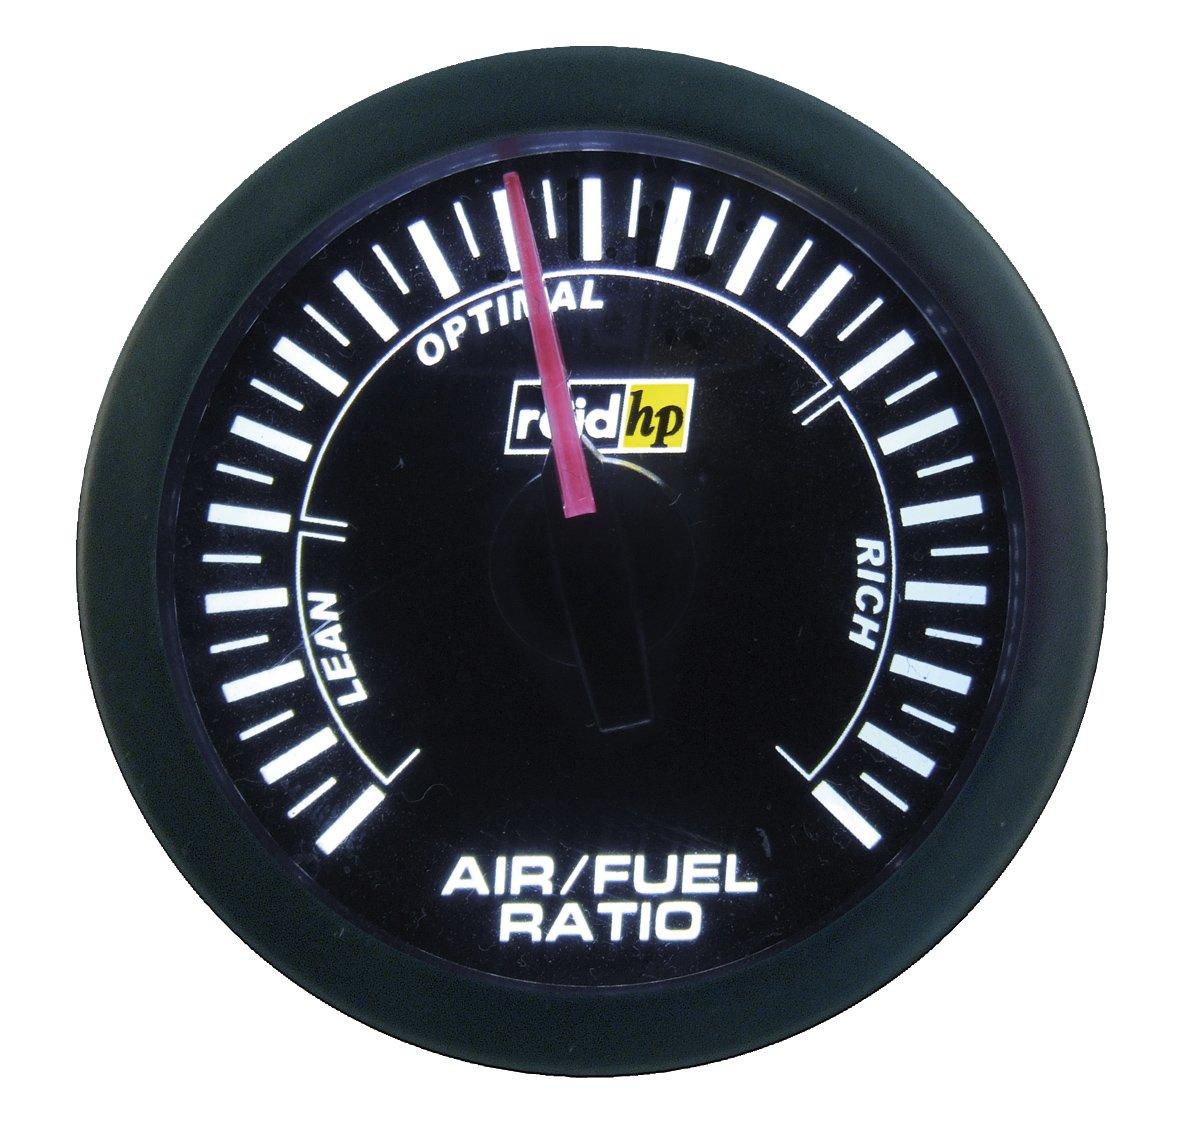 Raid HP Sport 660178 Auxiliary Lambda Display